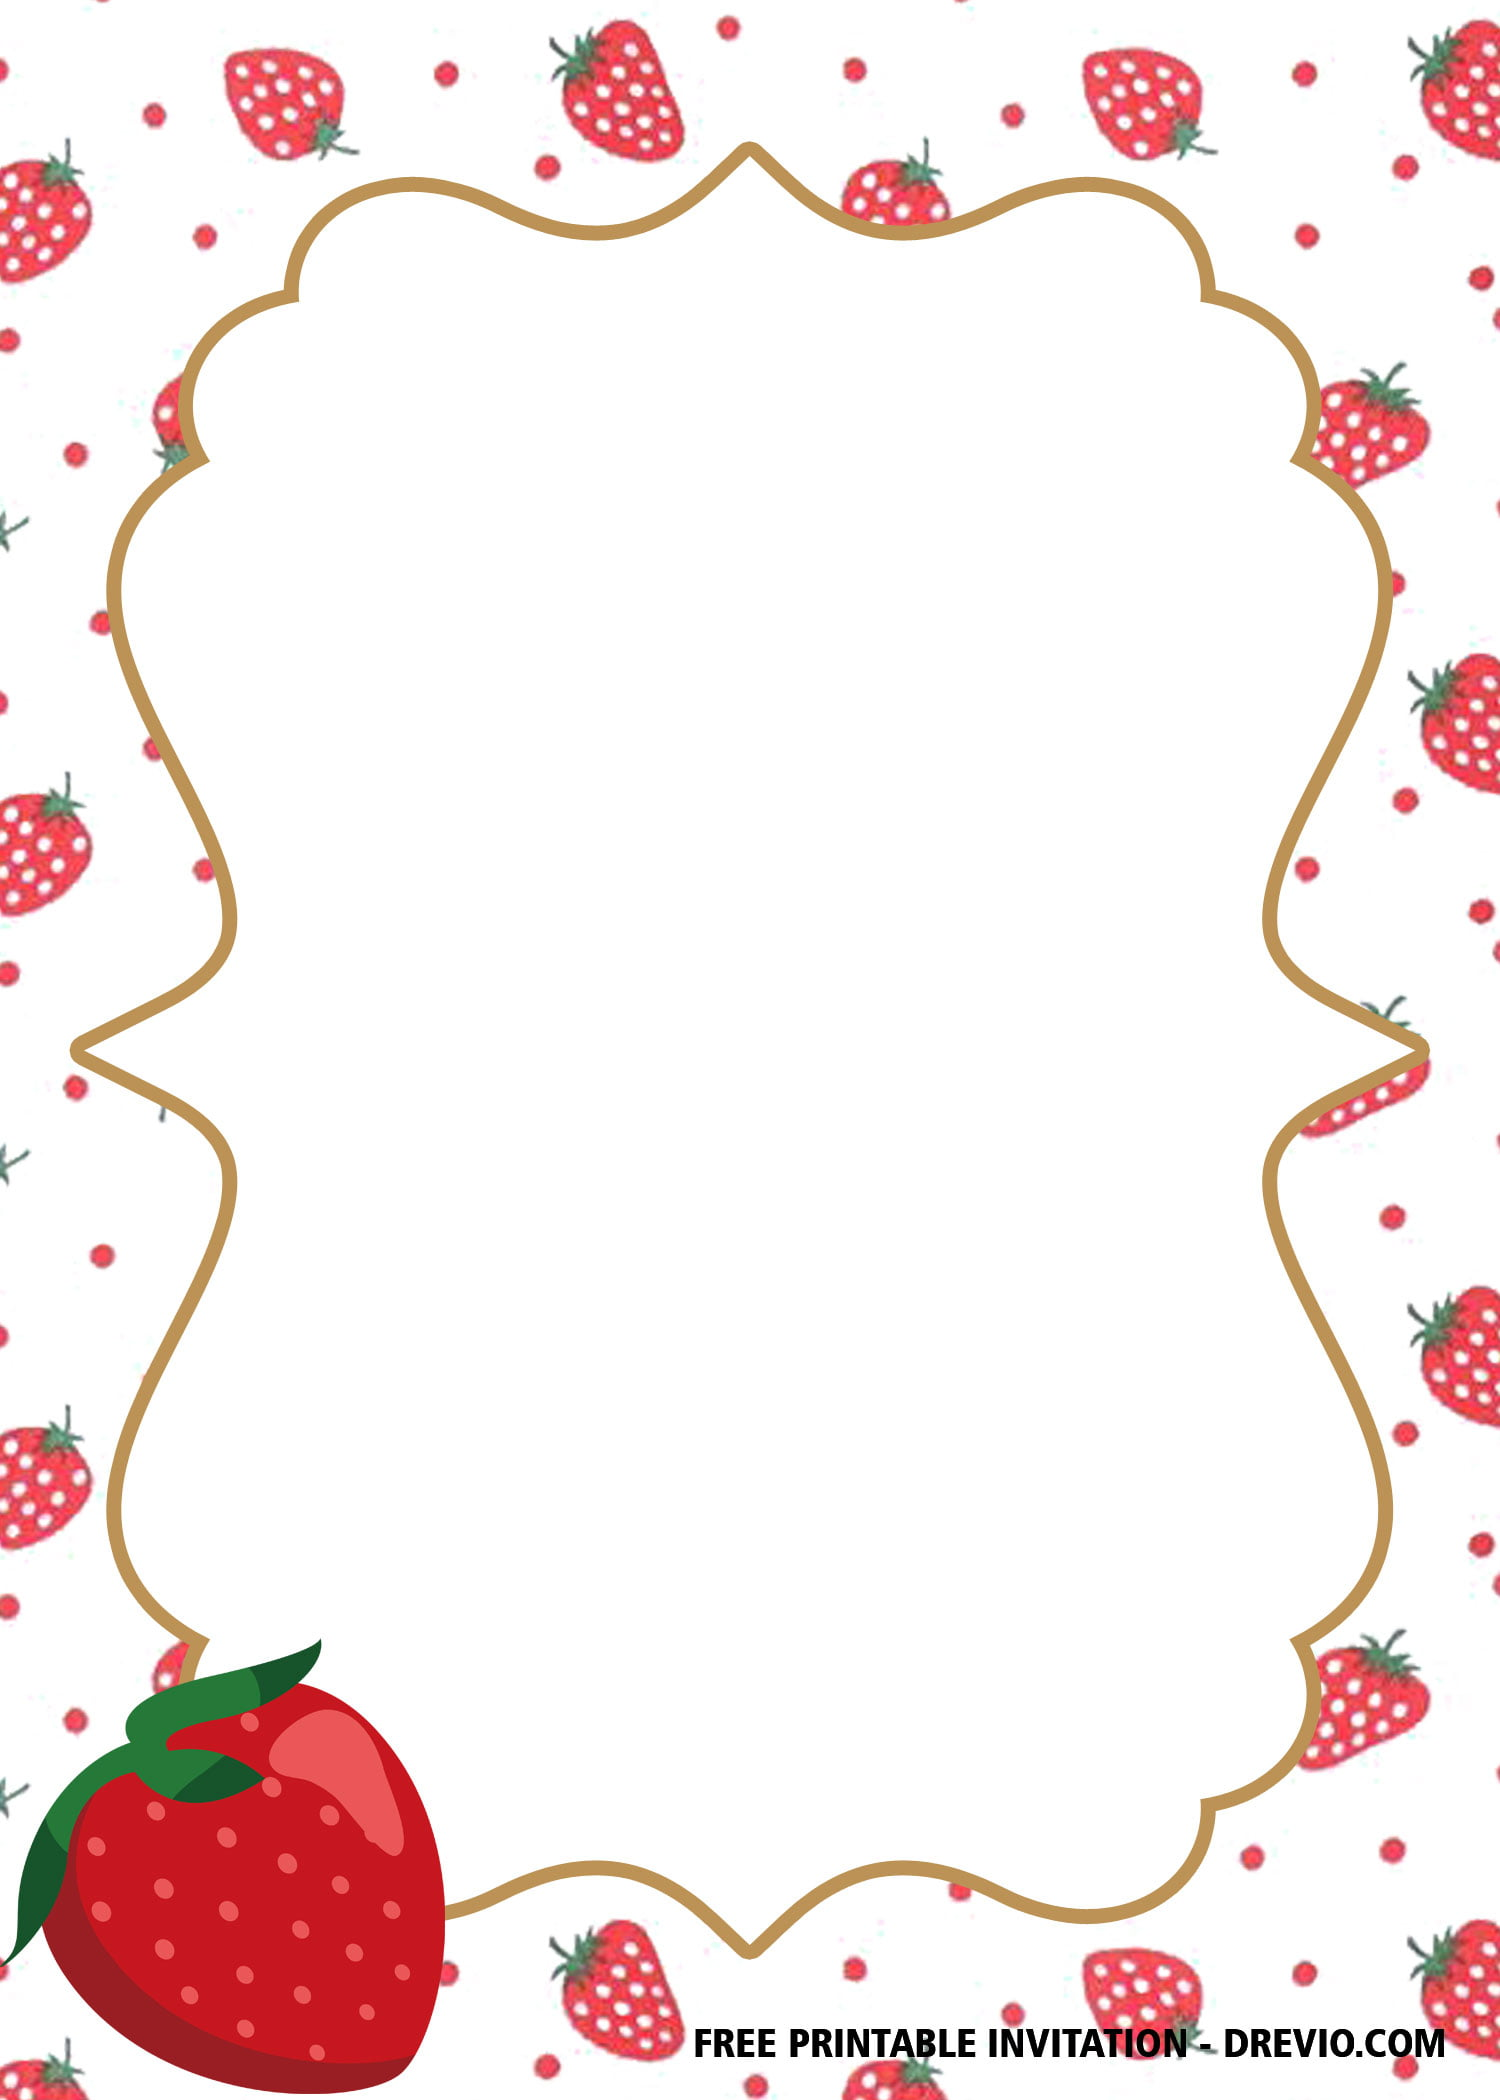 Free Printable Strawberry Birthday Invitation Templates